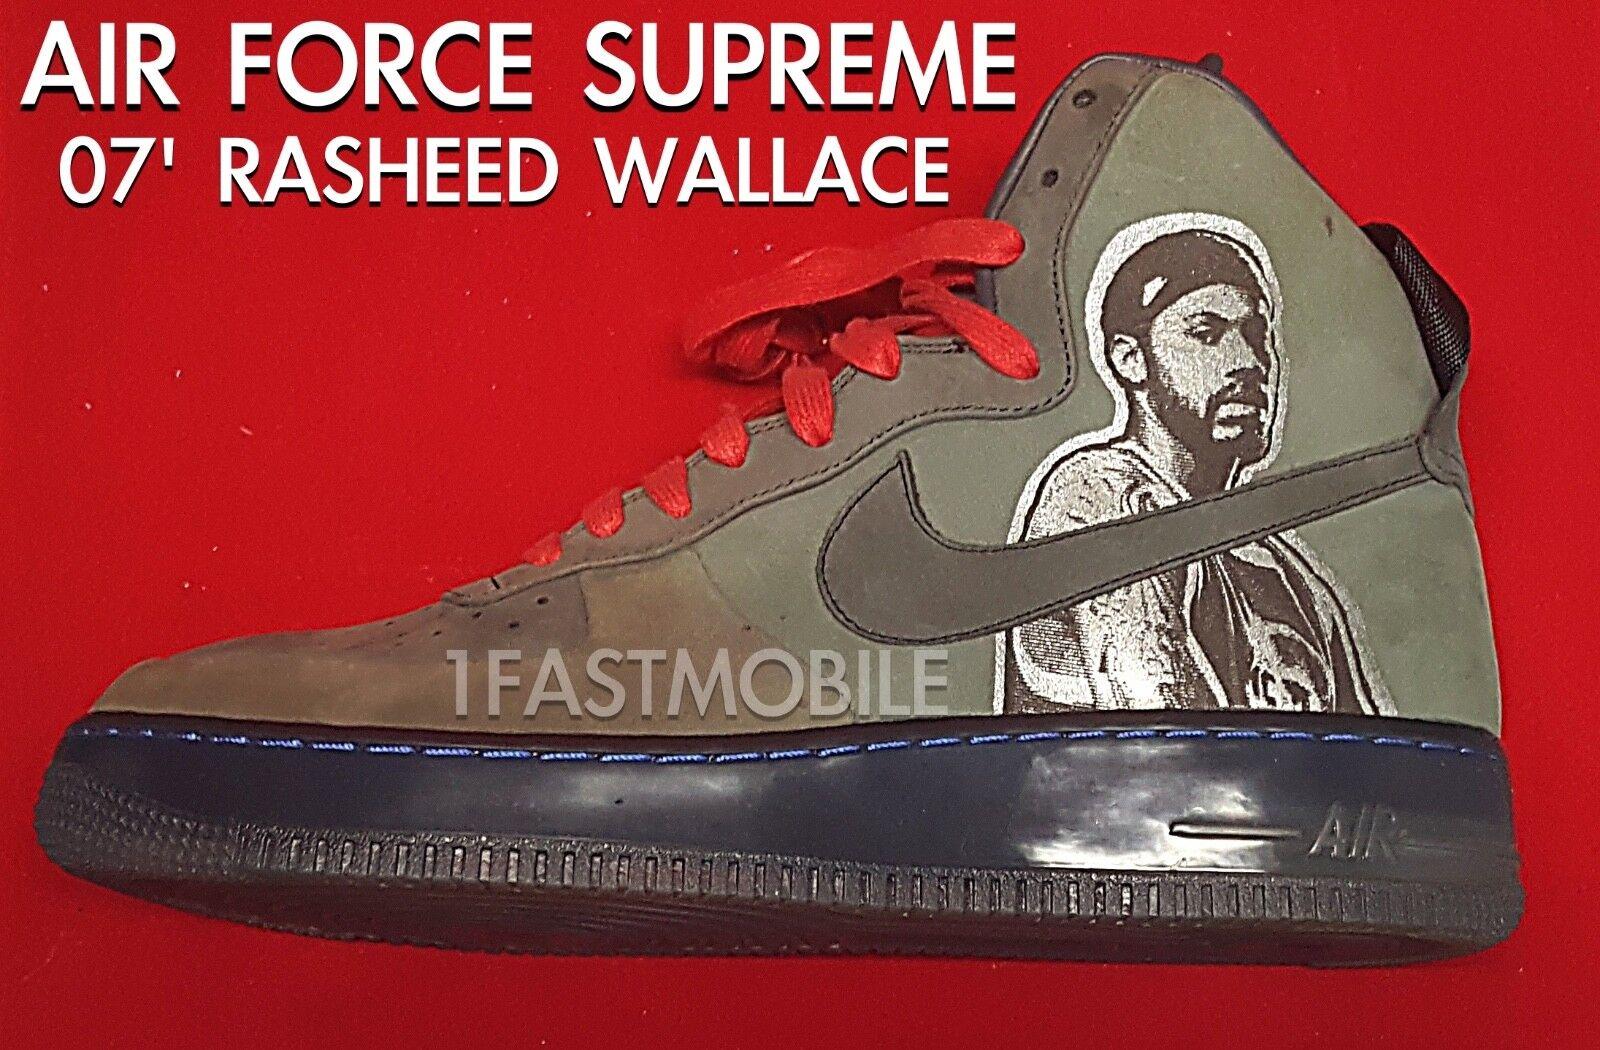 Air Force 1 Supreme 07 Rasheed Wallace